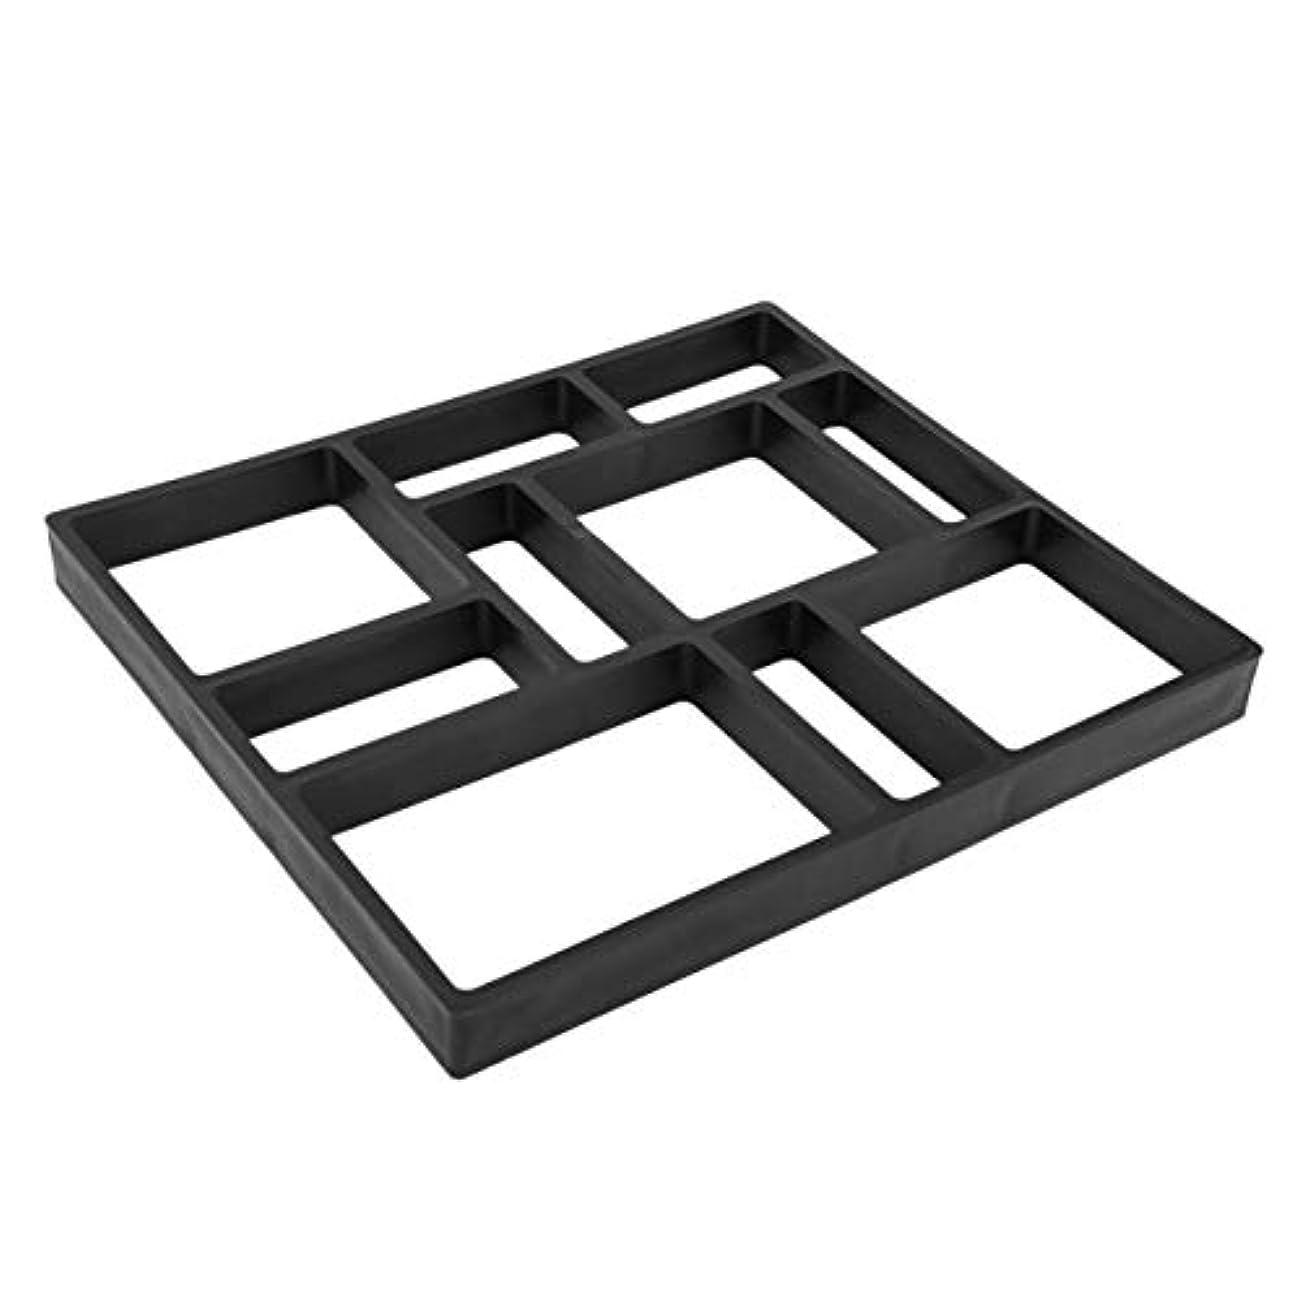 Saikogoods DIY不規則な/矩形パターンパーソナライズされた舗装のコンクリートレンガ石屋外装飾庭パスのメーカー芝生 黒